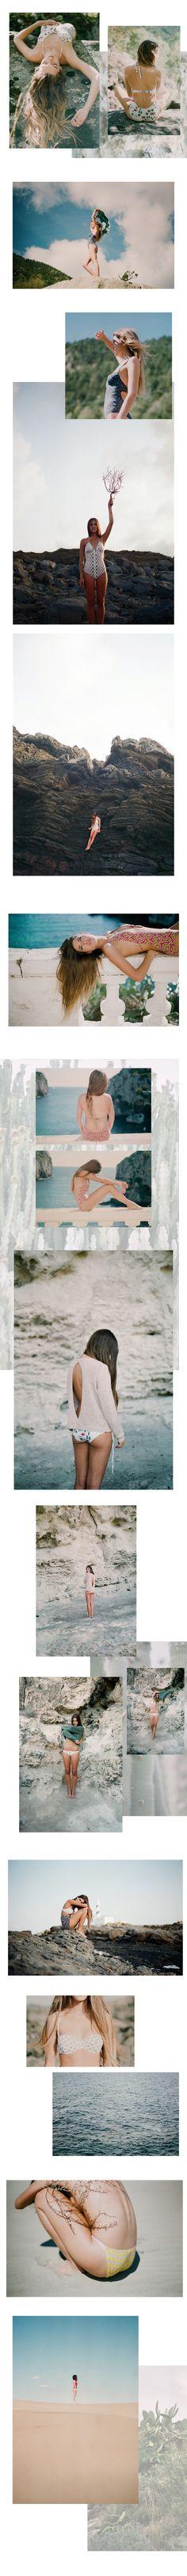 Summertime | Blog Nicethings